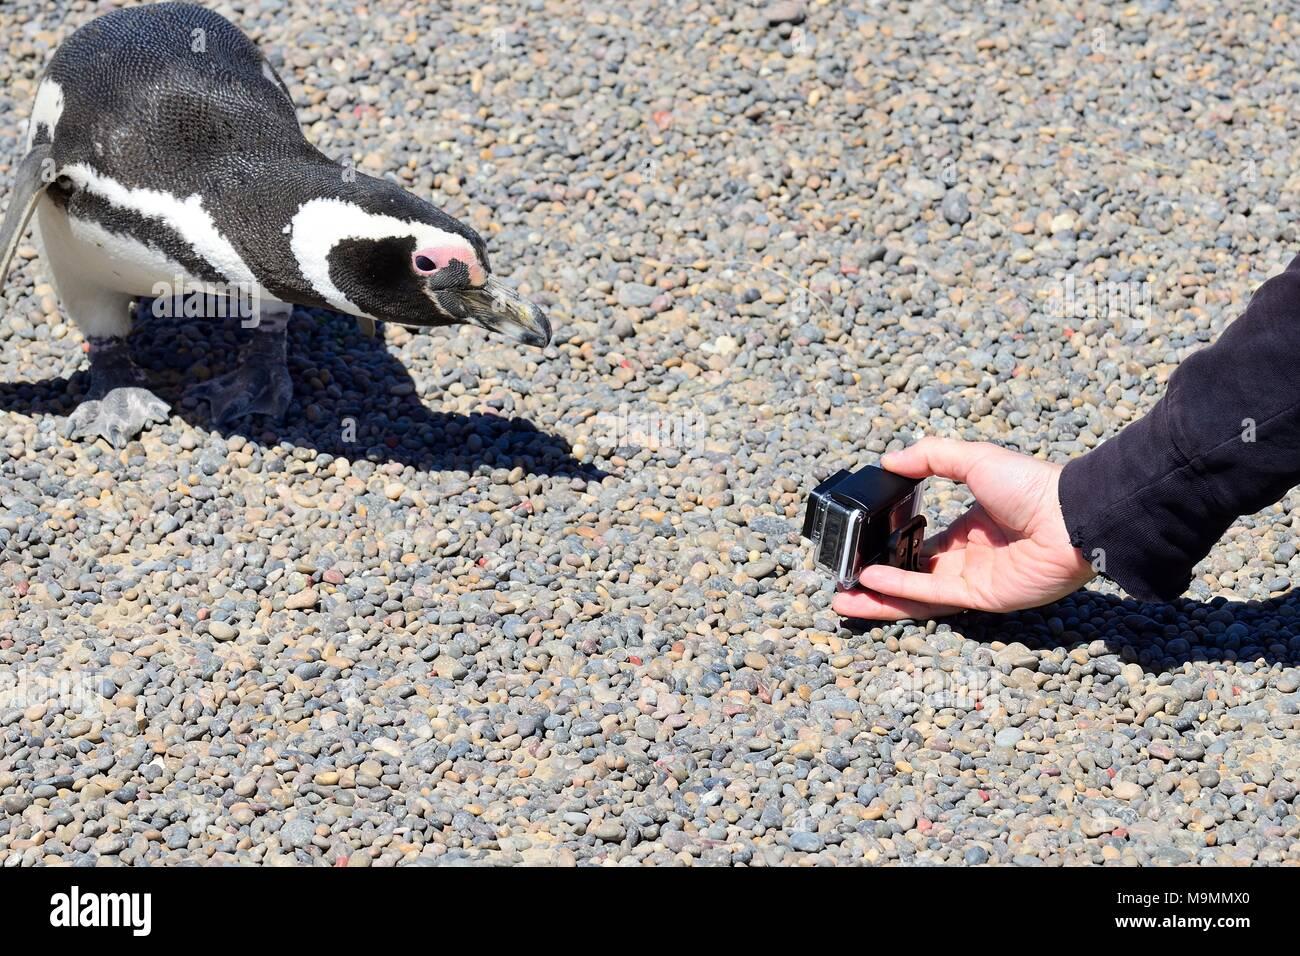 Tourist photographed curious Magellanic penguin (Spheniscus magellanicus), Punta Tombo, Chubut, Argentina - Stock Image